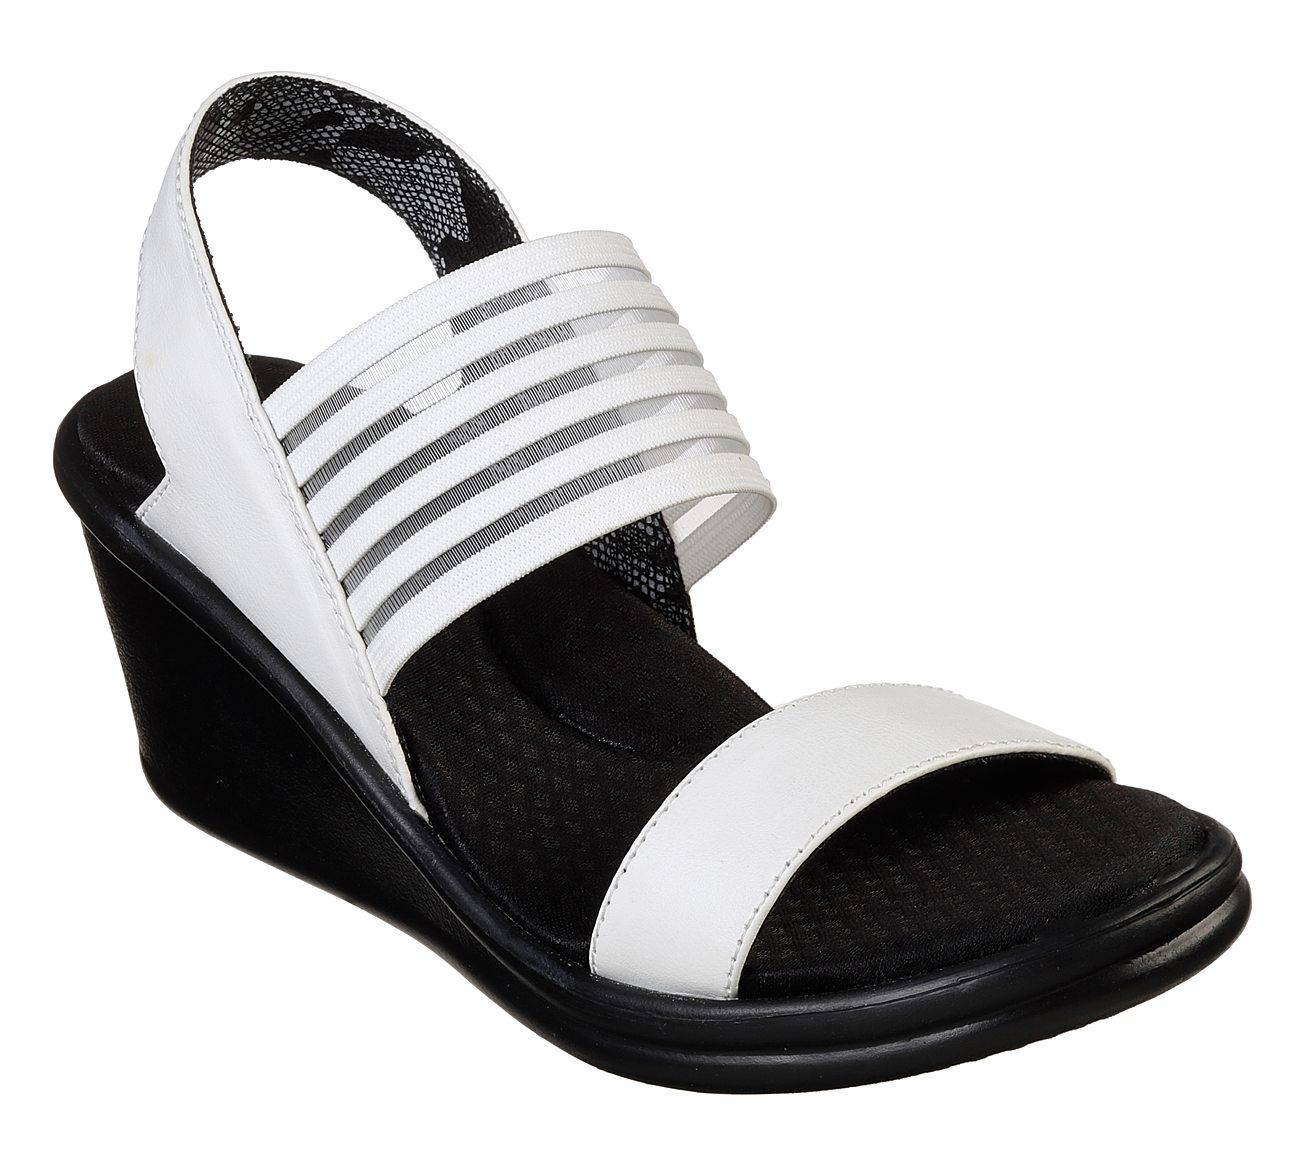 51429768b4 Buy SKECHERS Rumblers - Sci Fi SKECHERS Cali Shoes only £37.00